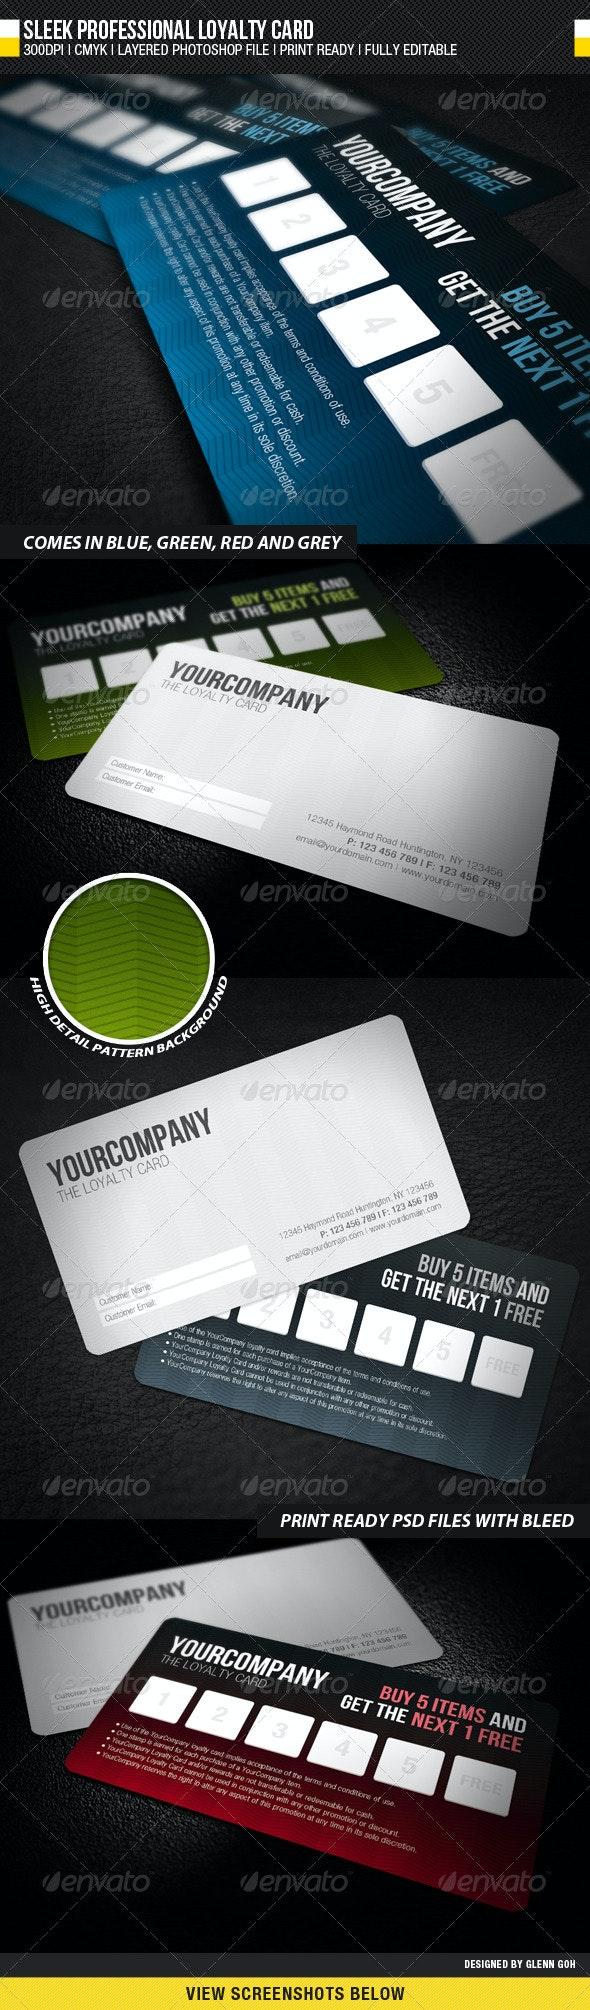 Sleek Professional Loyalty Card - Loyalty Cards Cards & Invites